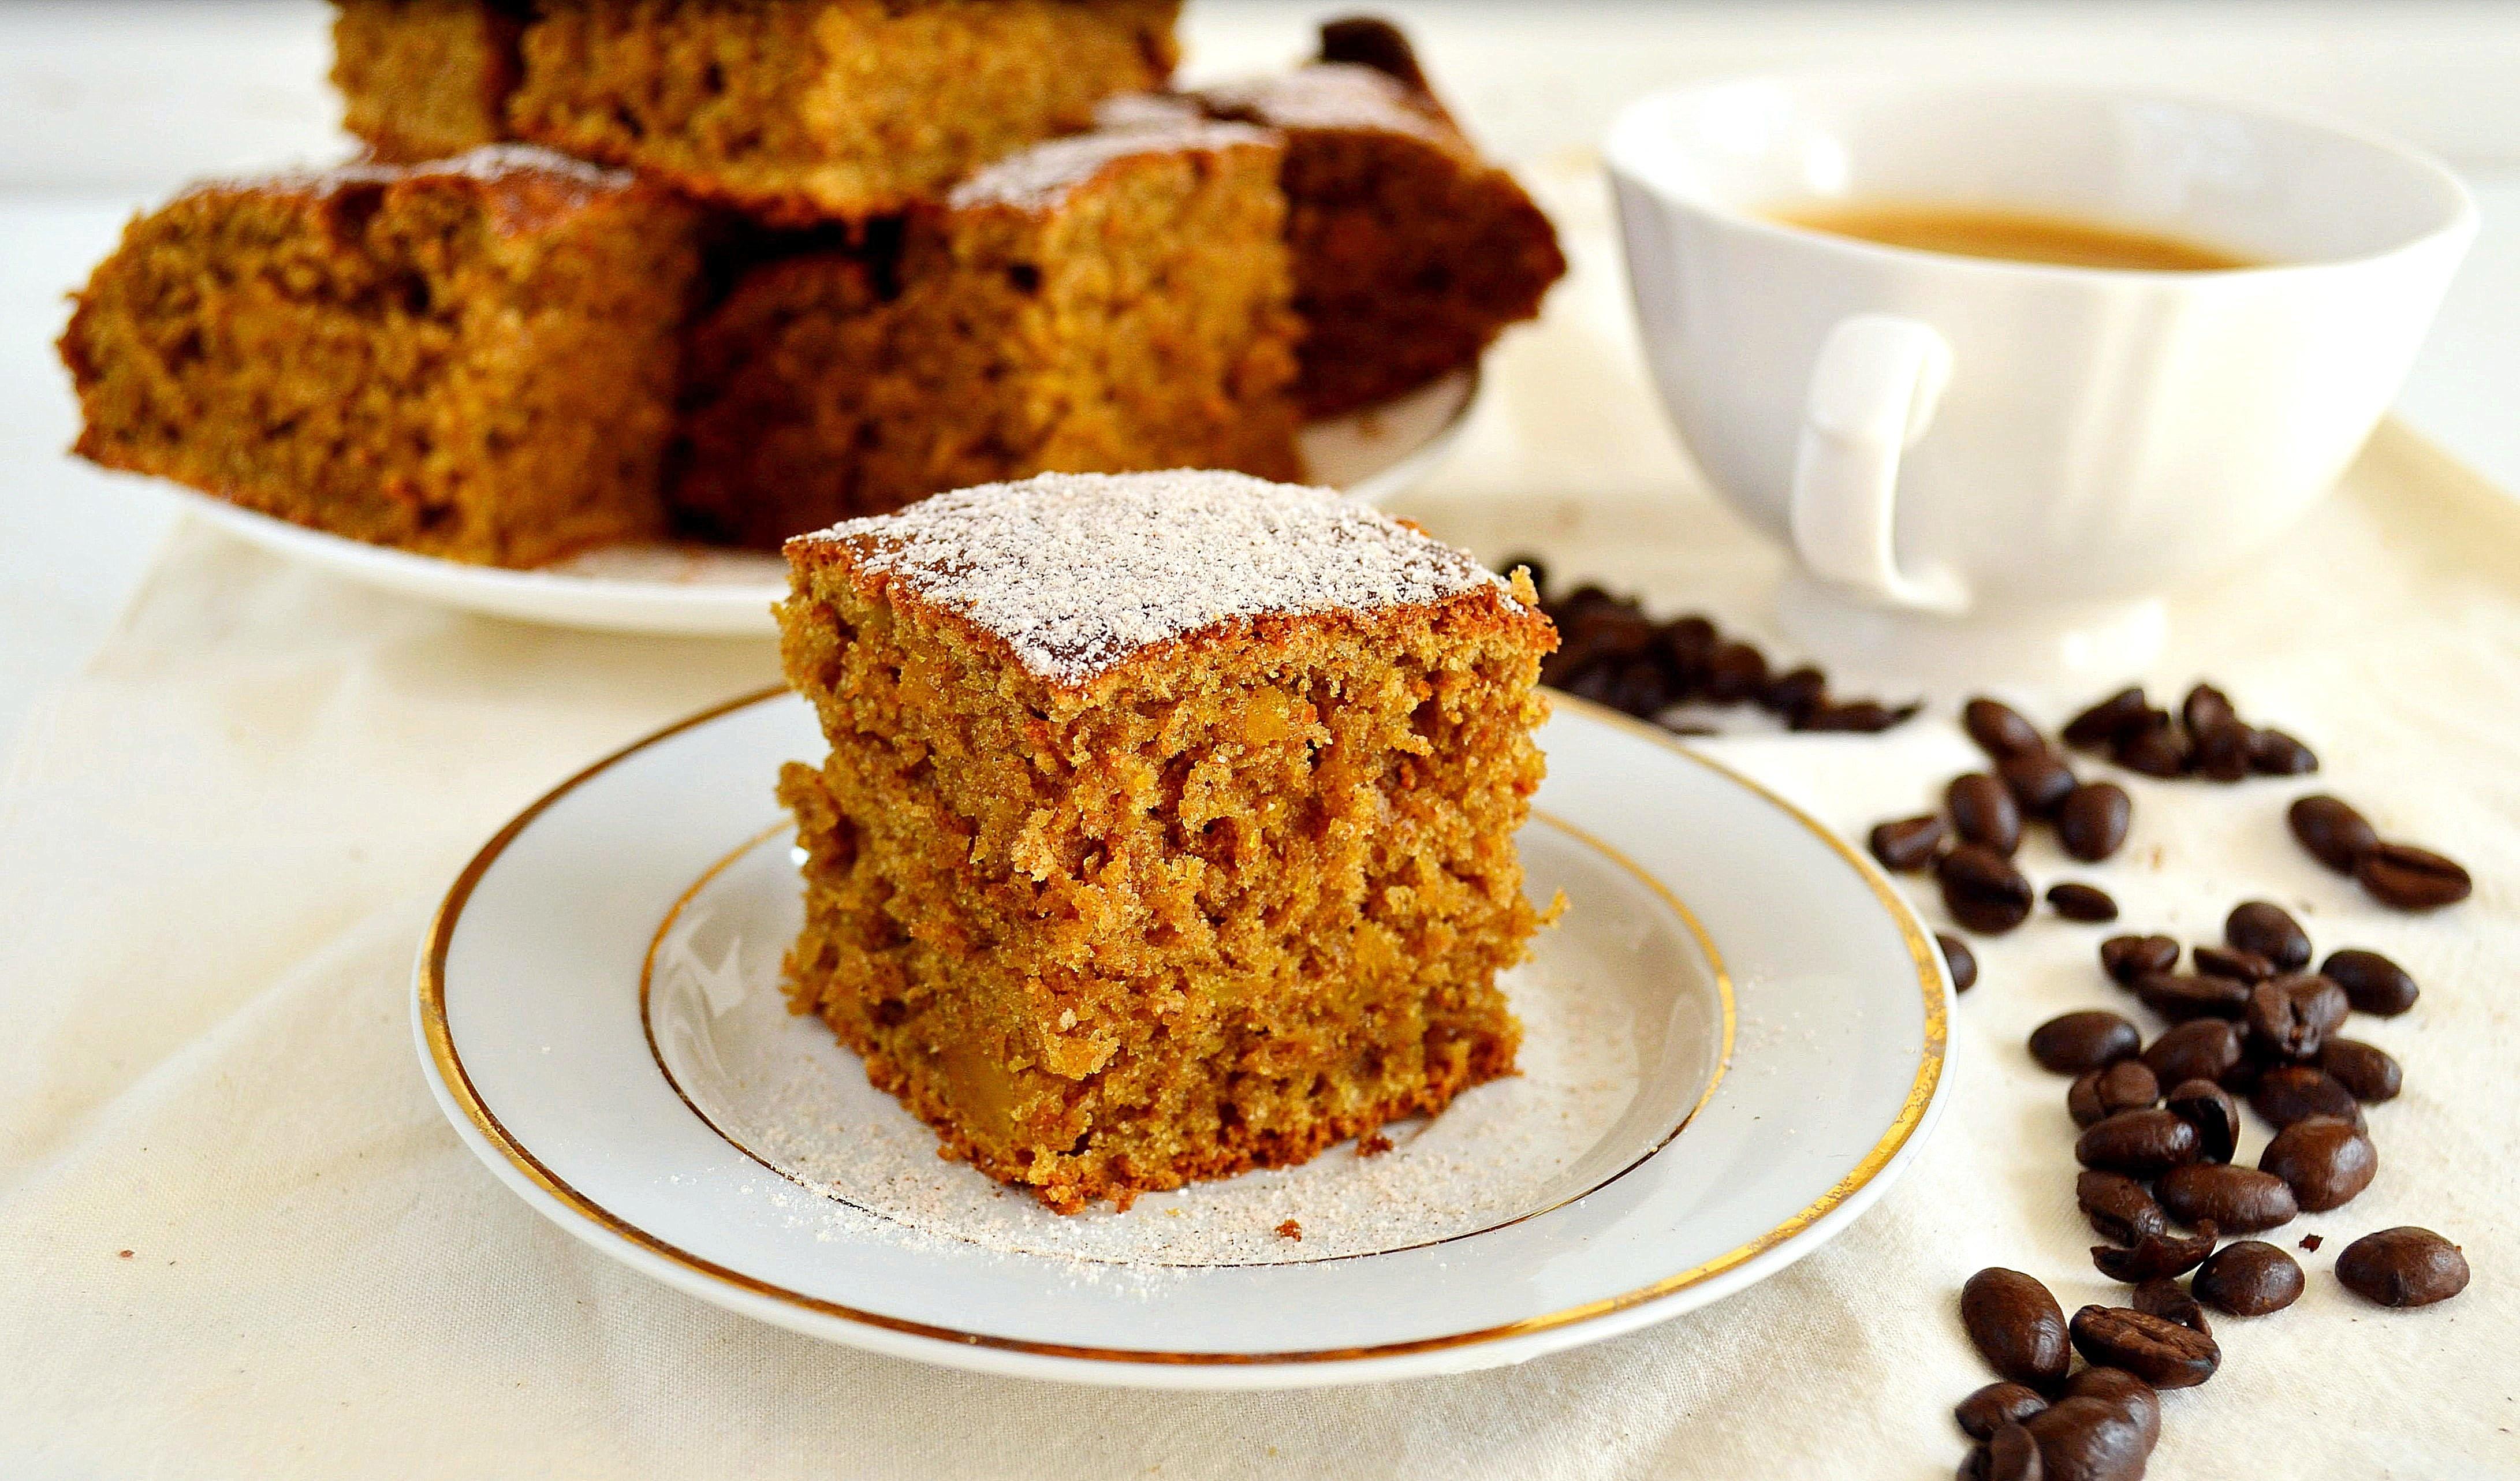 Ciasto dyniowo-kawowe bez cukru i mleka